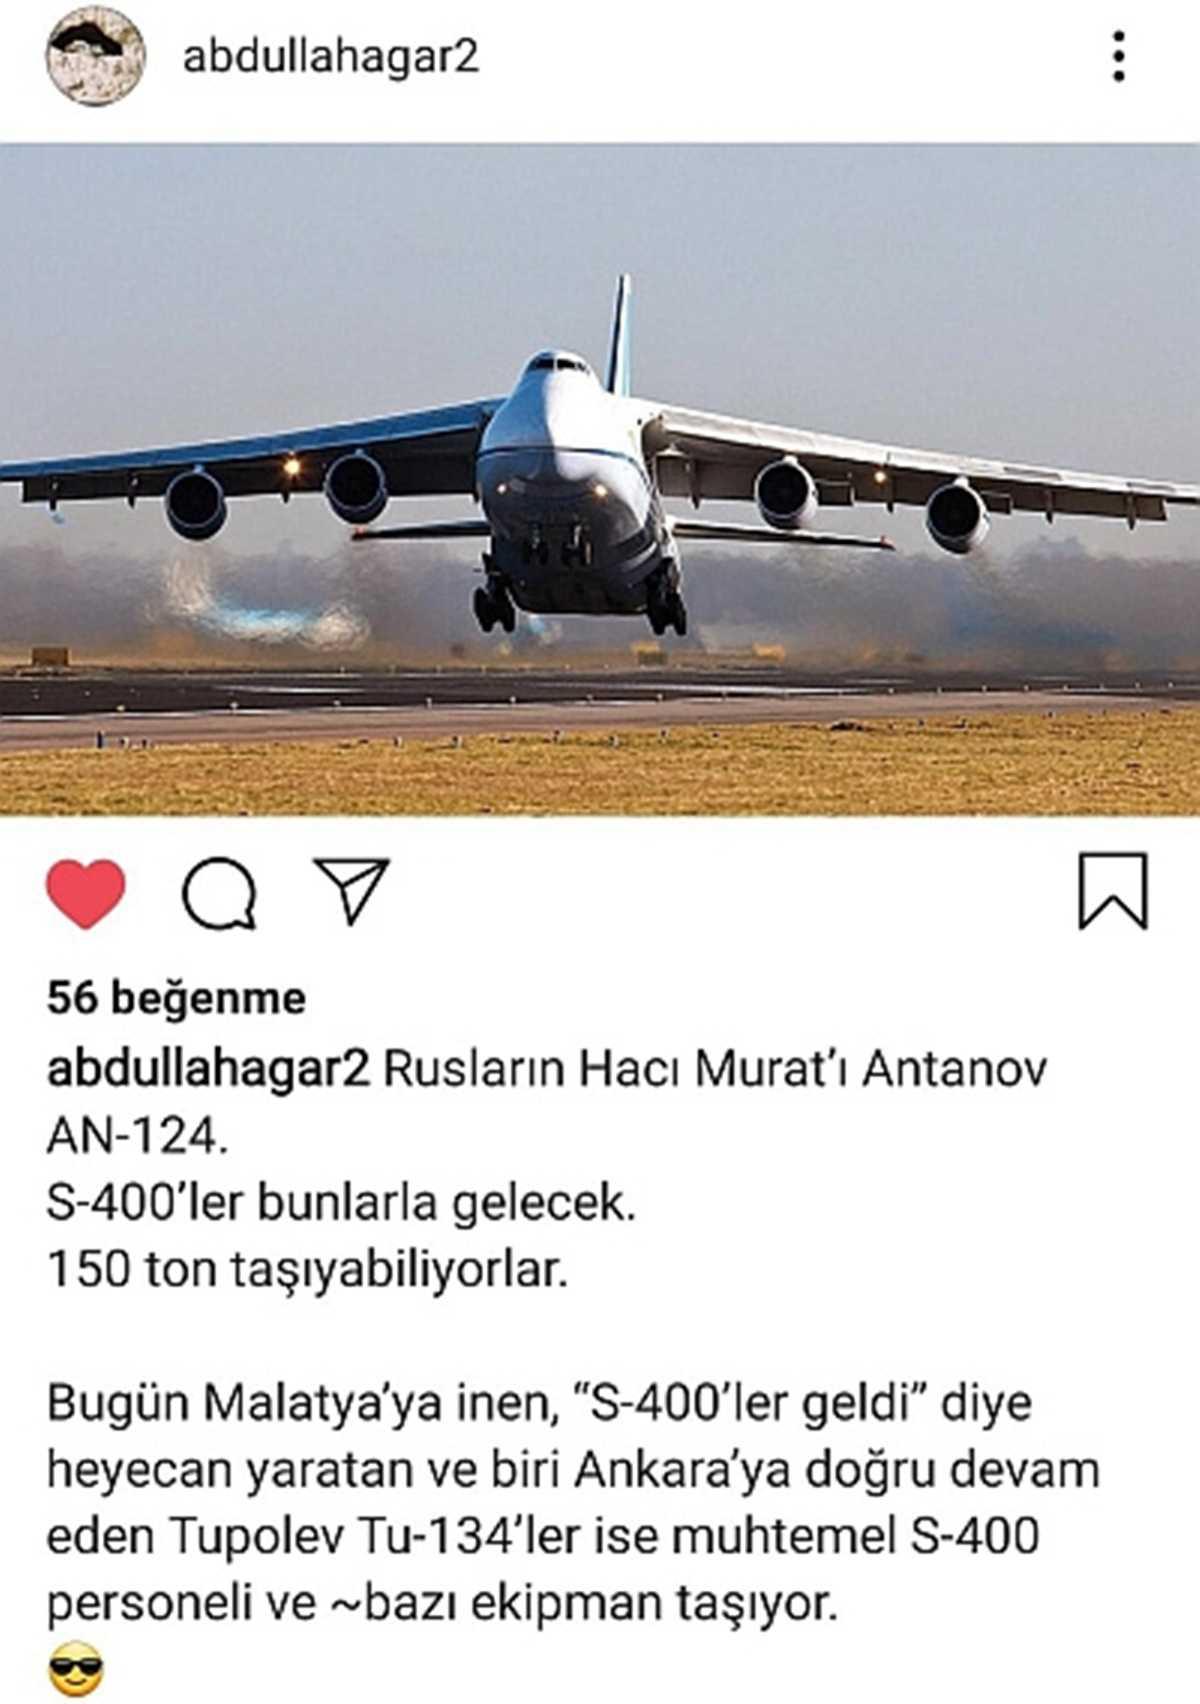 Malatya'ya İnen Gizemli Rus Uçağının S-400 Hava Savunma Sistemi ile İlgili Olduğu İddia Edildi